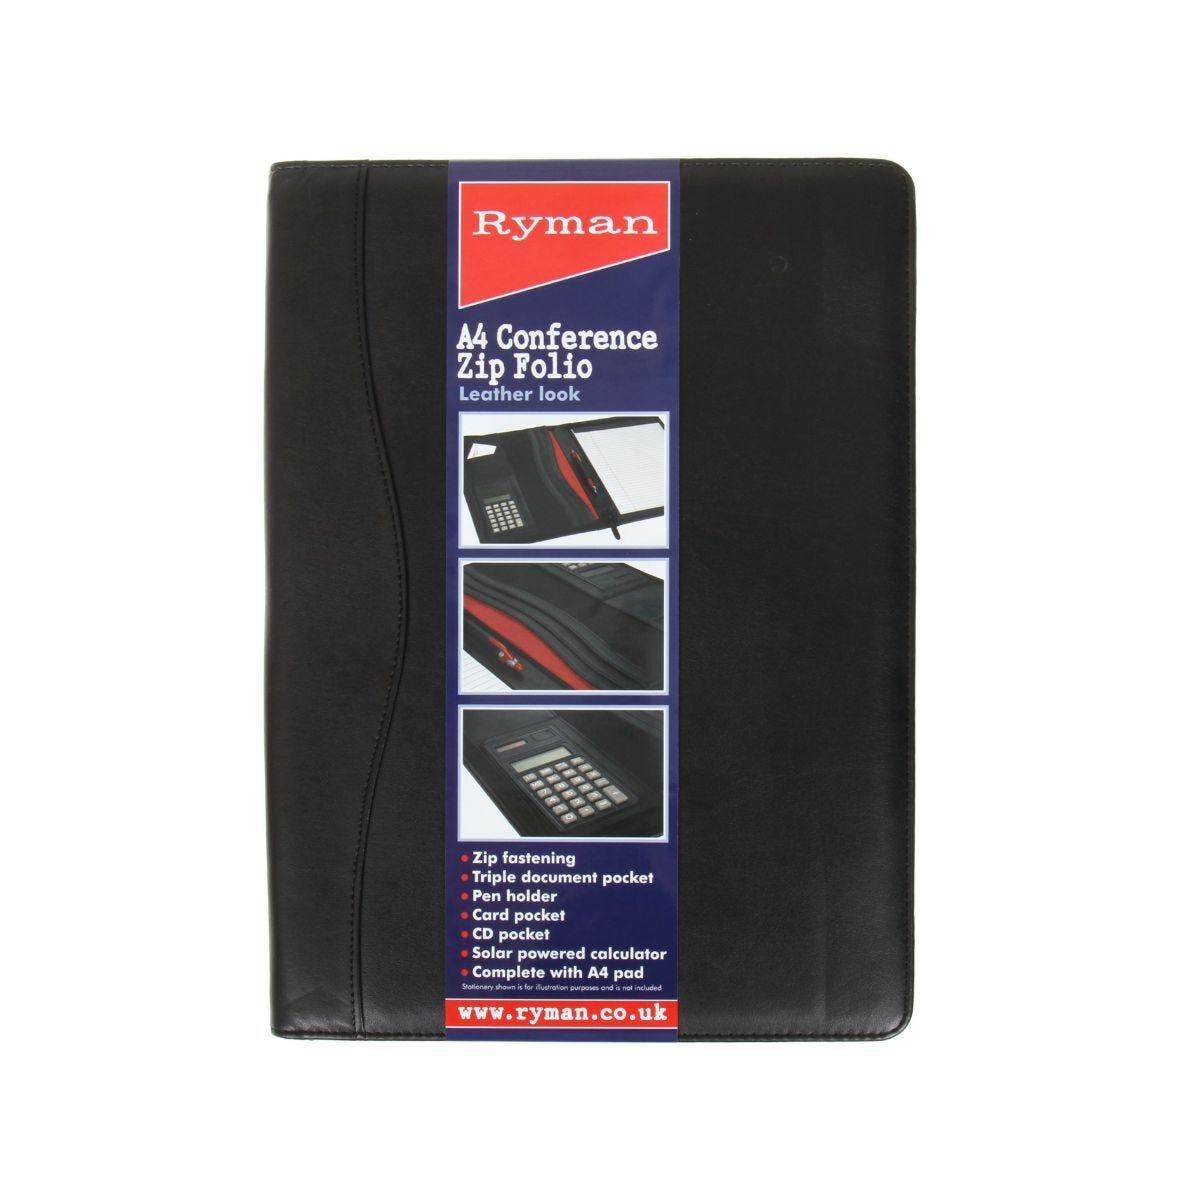 Ryman Conference Folder A4 Zip Fastener